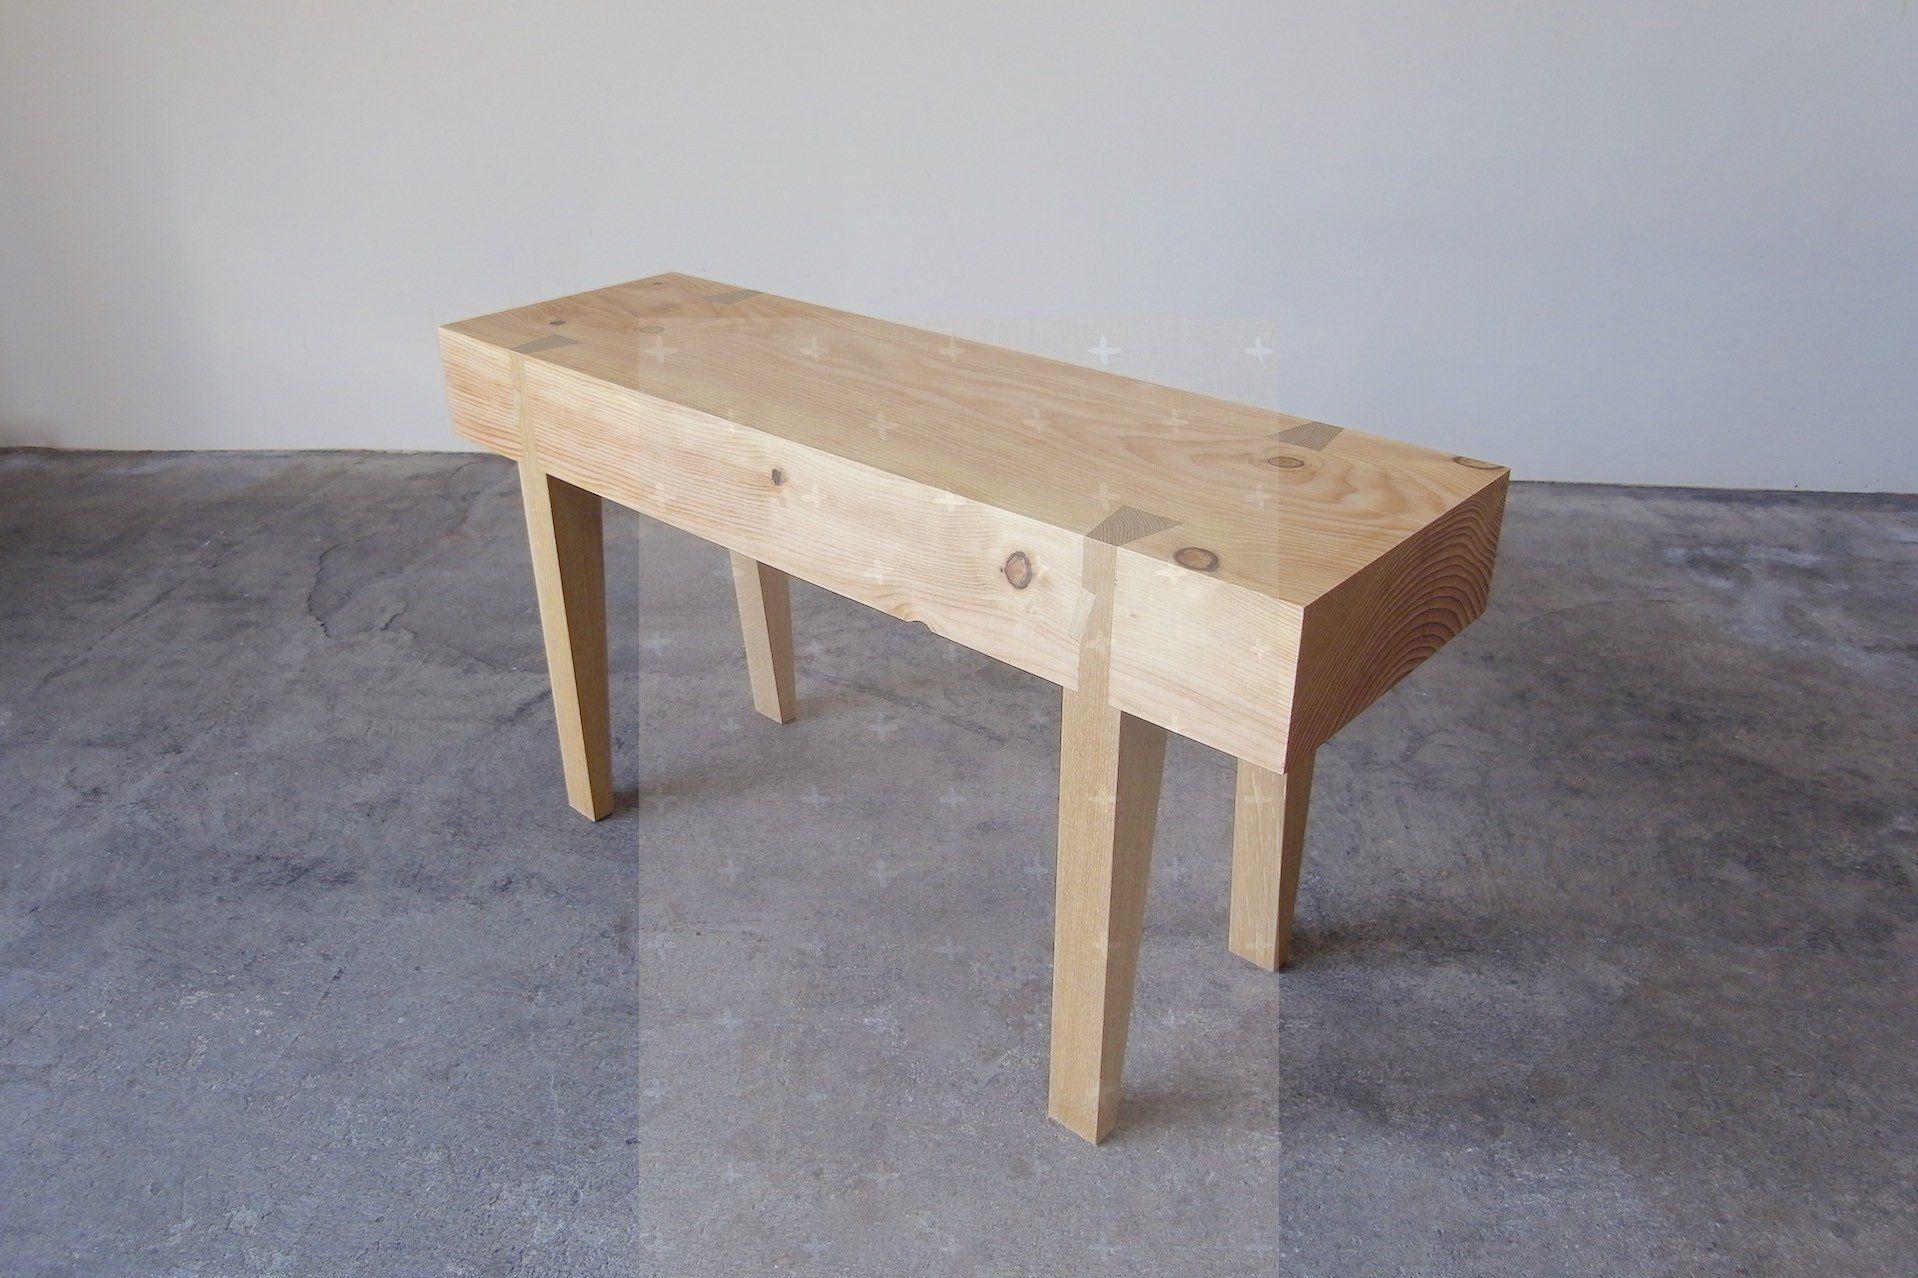 Badezimmer eitelkeit shaker stil astonishing cool ideas woodworking ideas menus woodworking joints